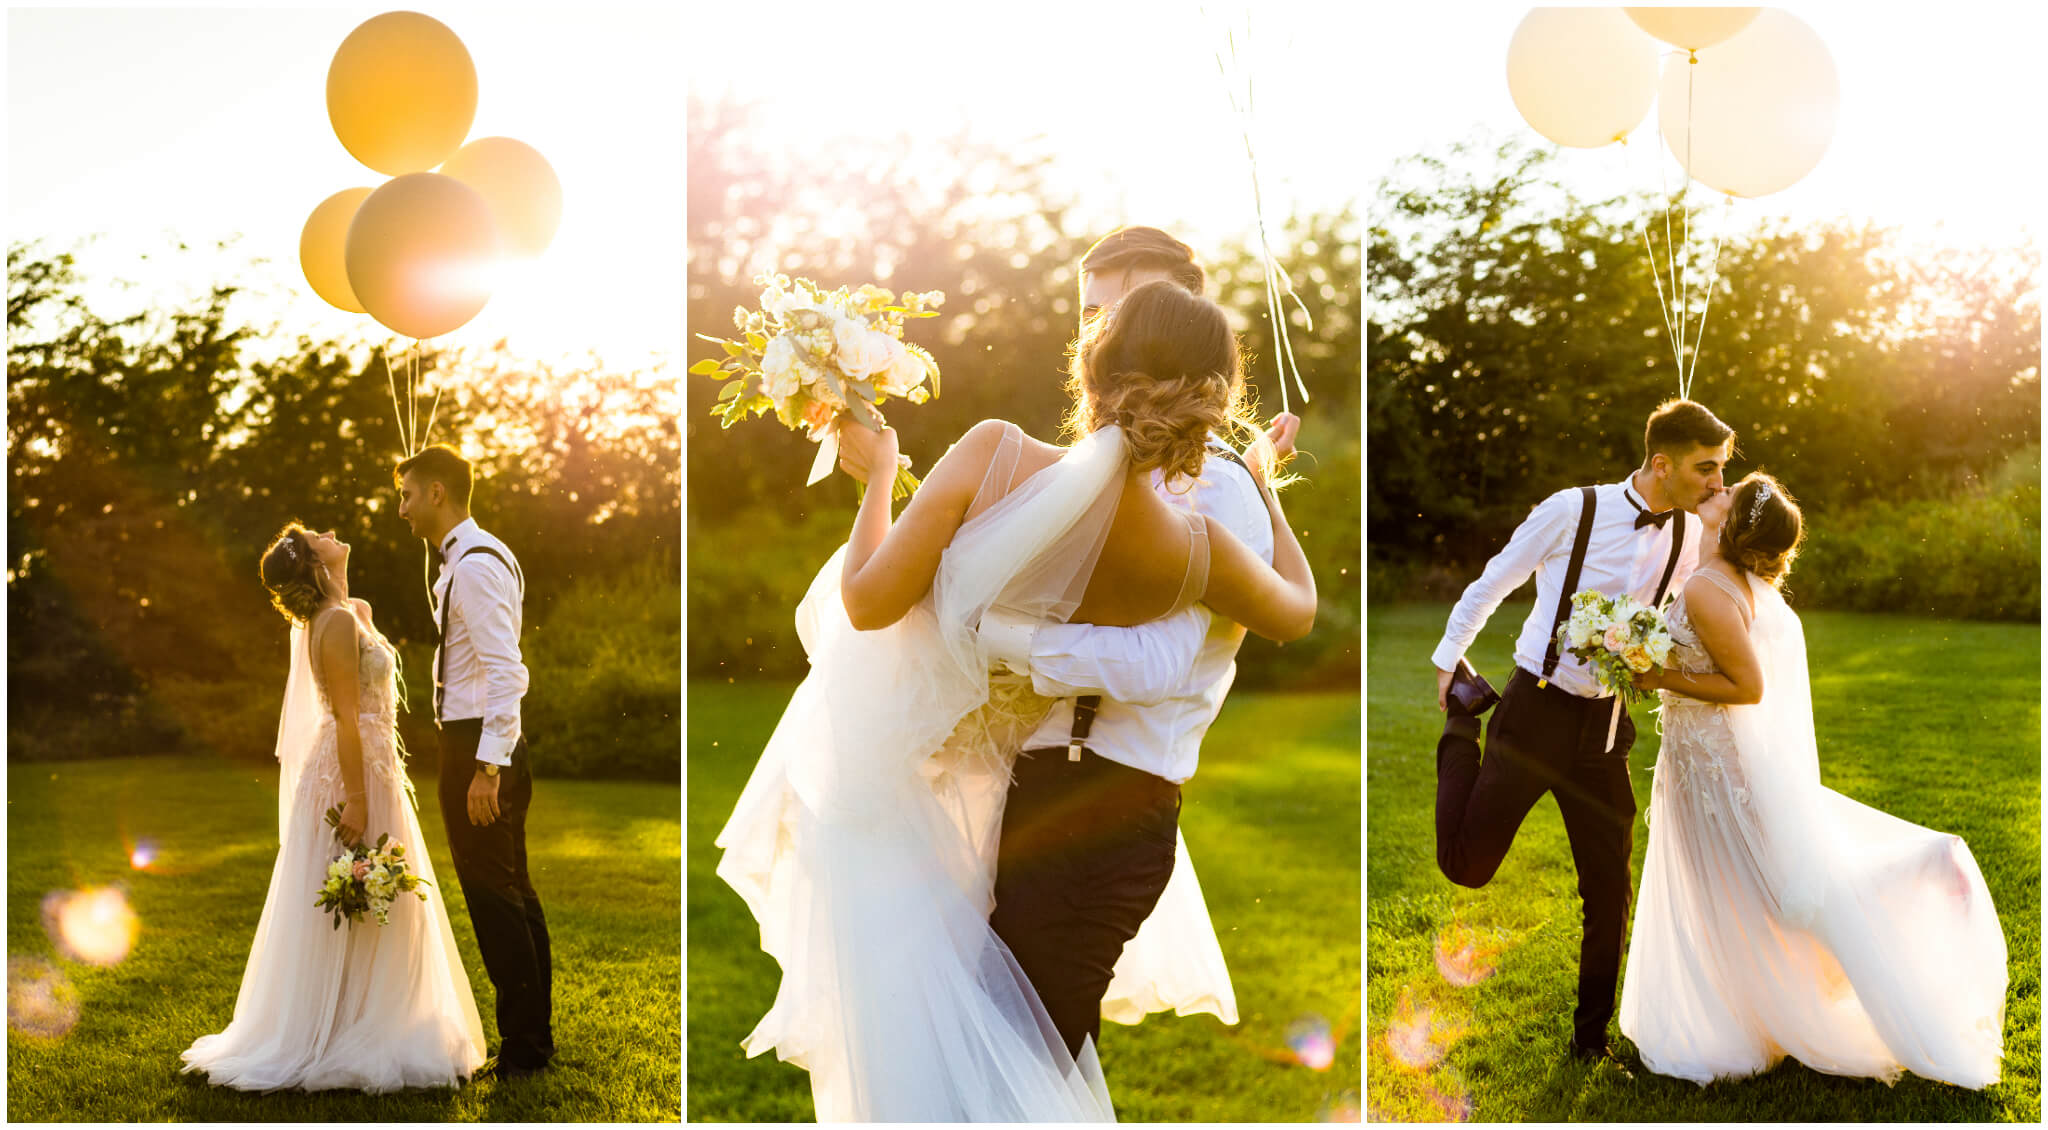 Fotografie de nunta Dana Sacalov